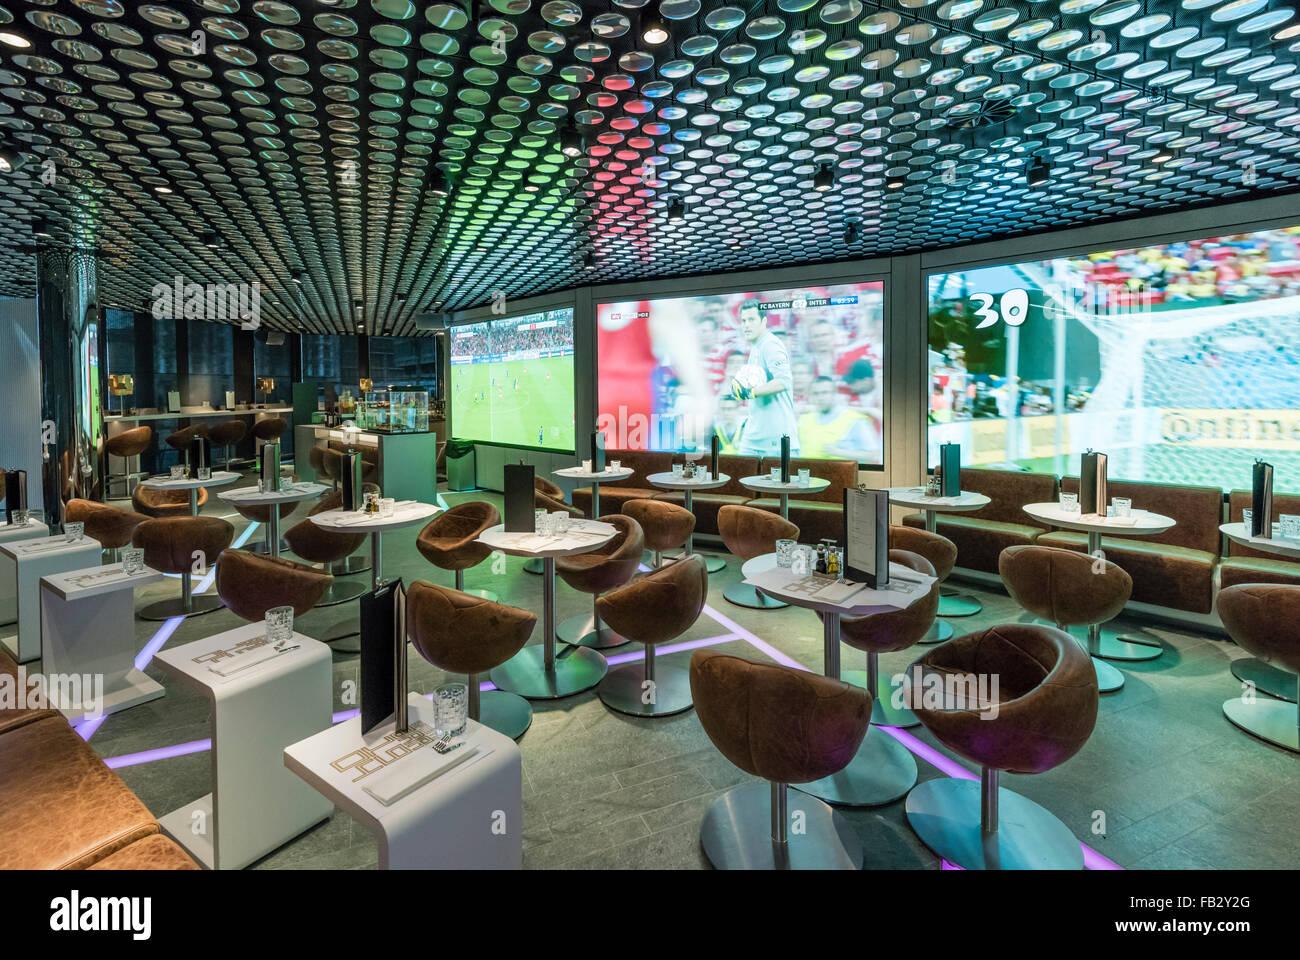 B & N Sports Bar, Roosevelt Av, San Antonio, TX - inspection findings and violations.